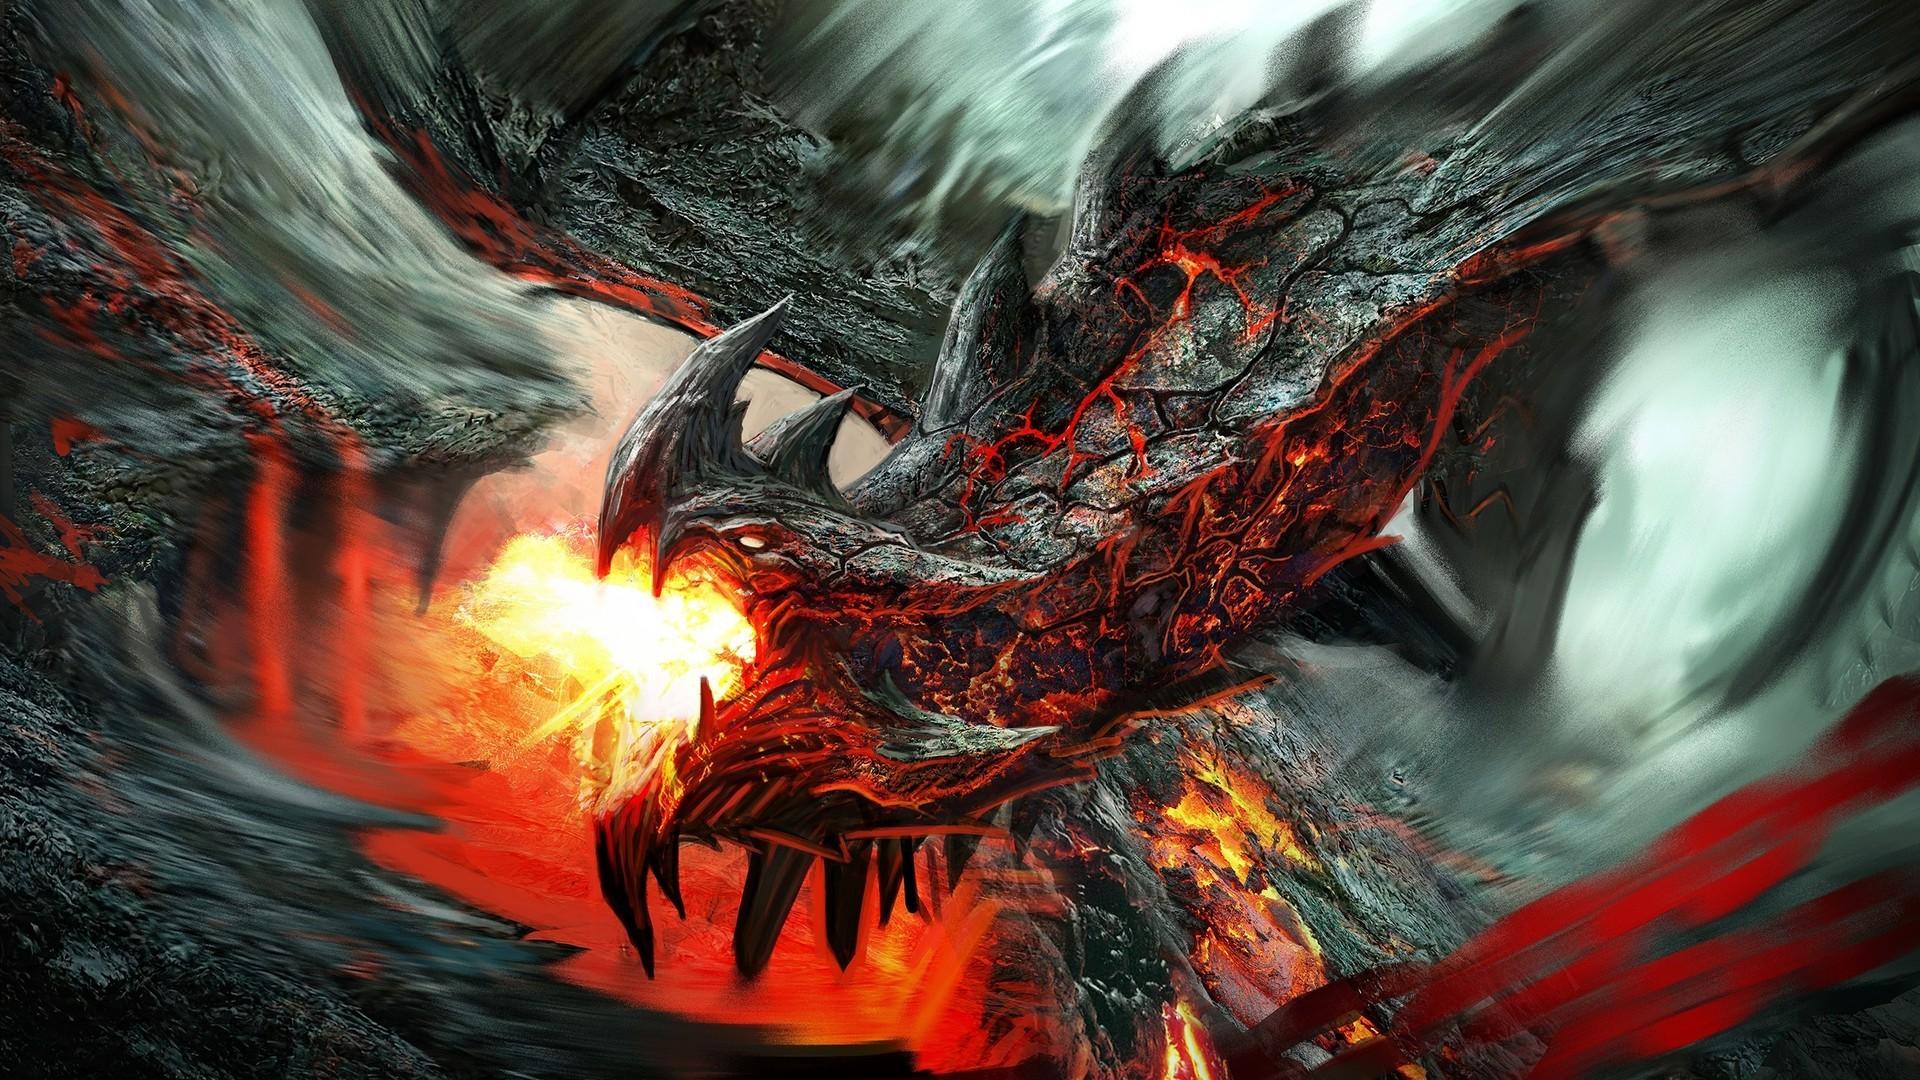 Fire Lava Dragon Wallpapers Fantasy Desktop.